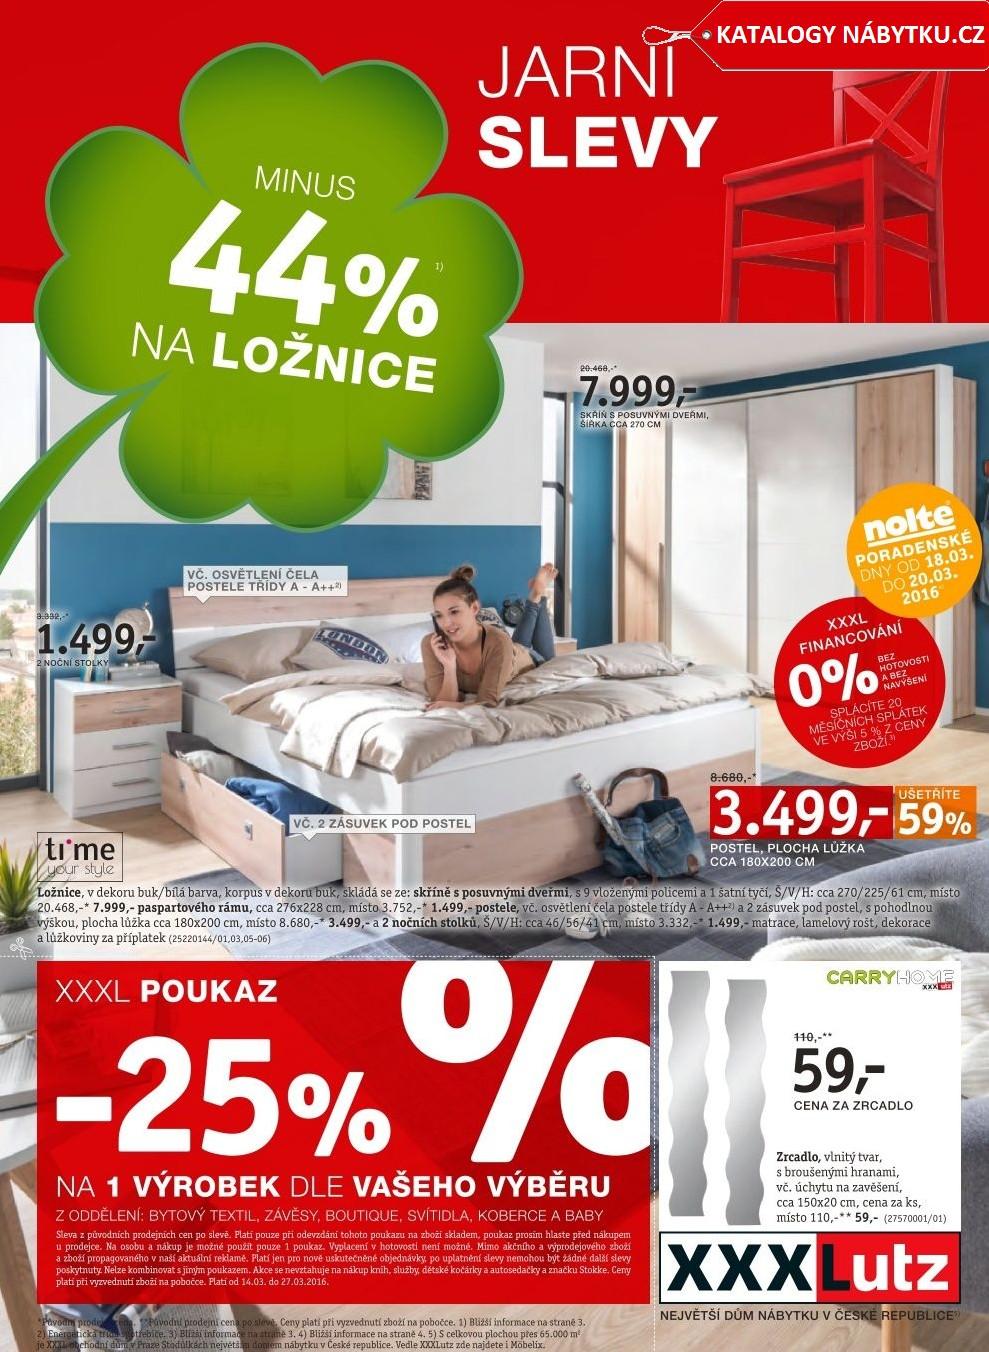 katalog xxxlutz od 14 3. Black Bedroom Furniture Sets. Home Design Ideas